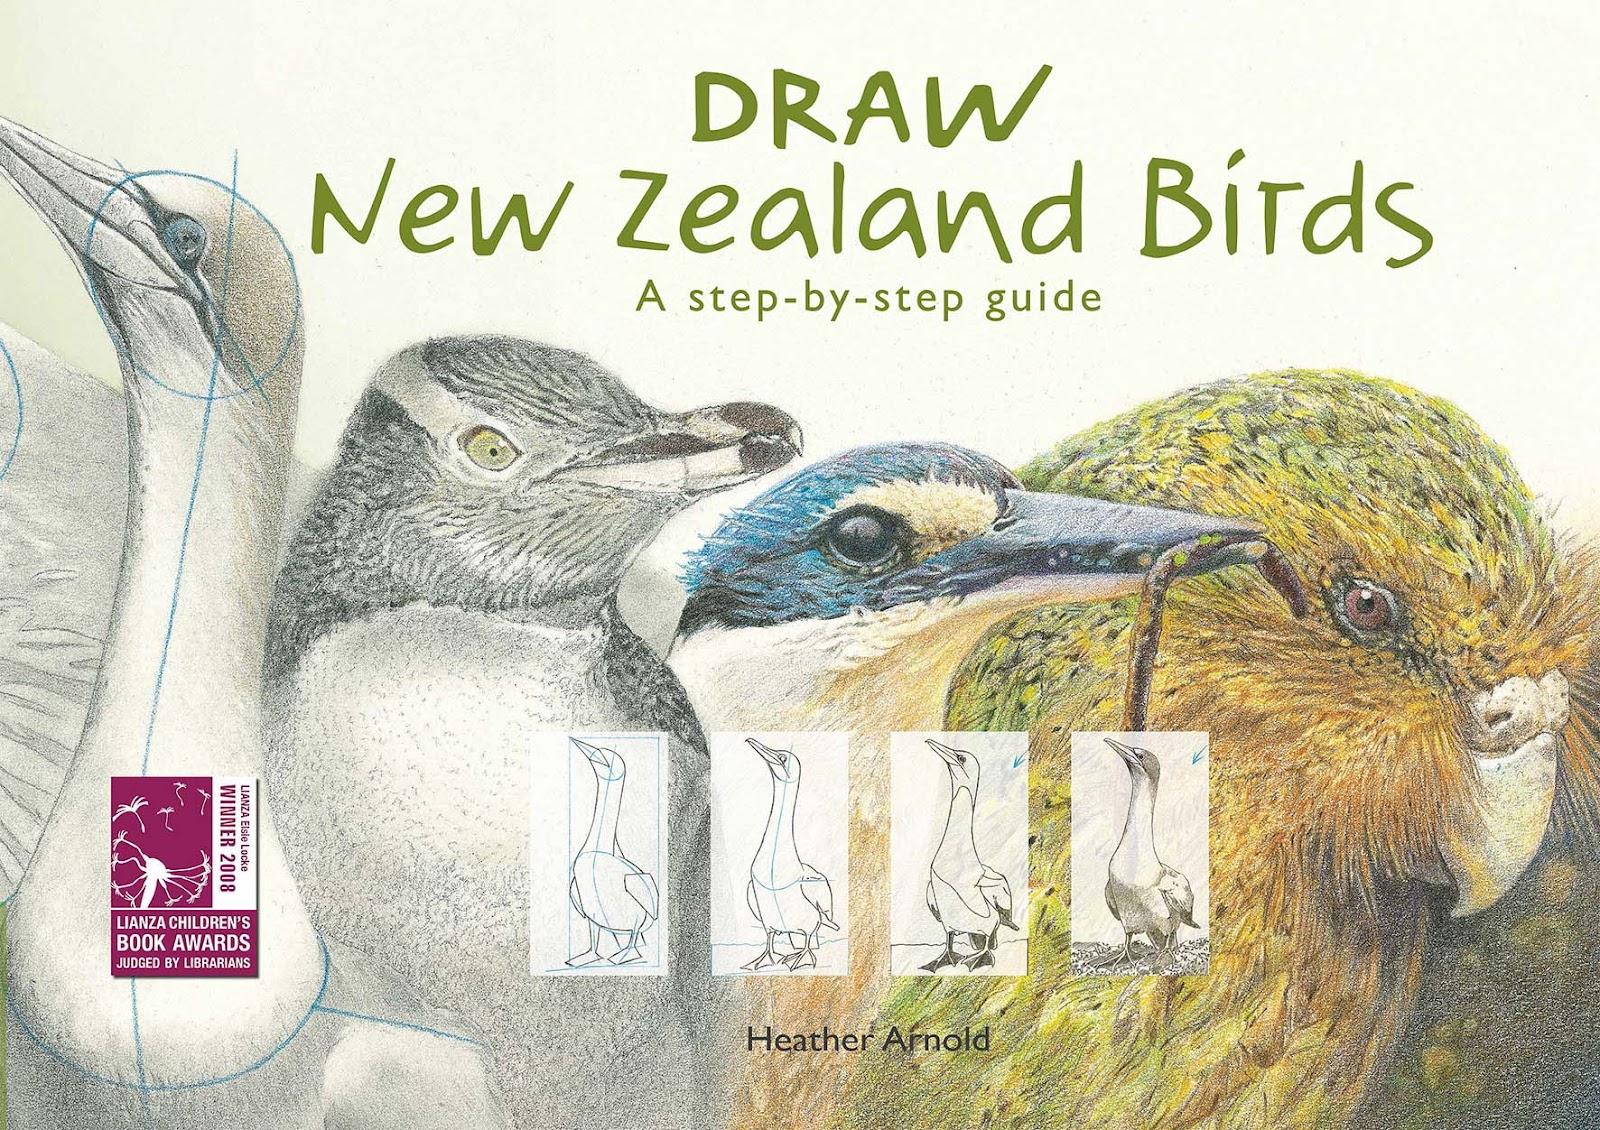 Draw New Zealand Birds_Cover3_2014.jpg